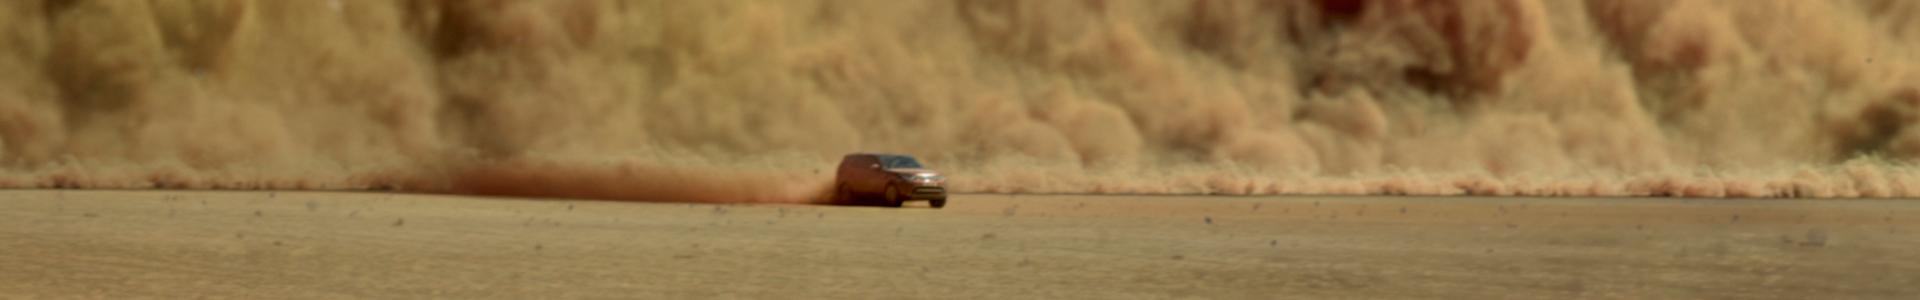 Land Rover Discovery im Sandsturm